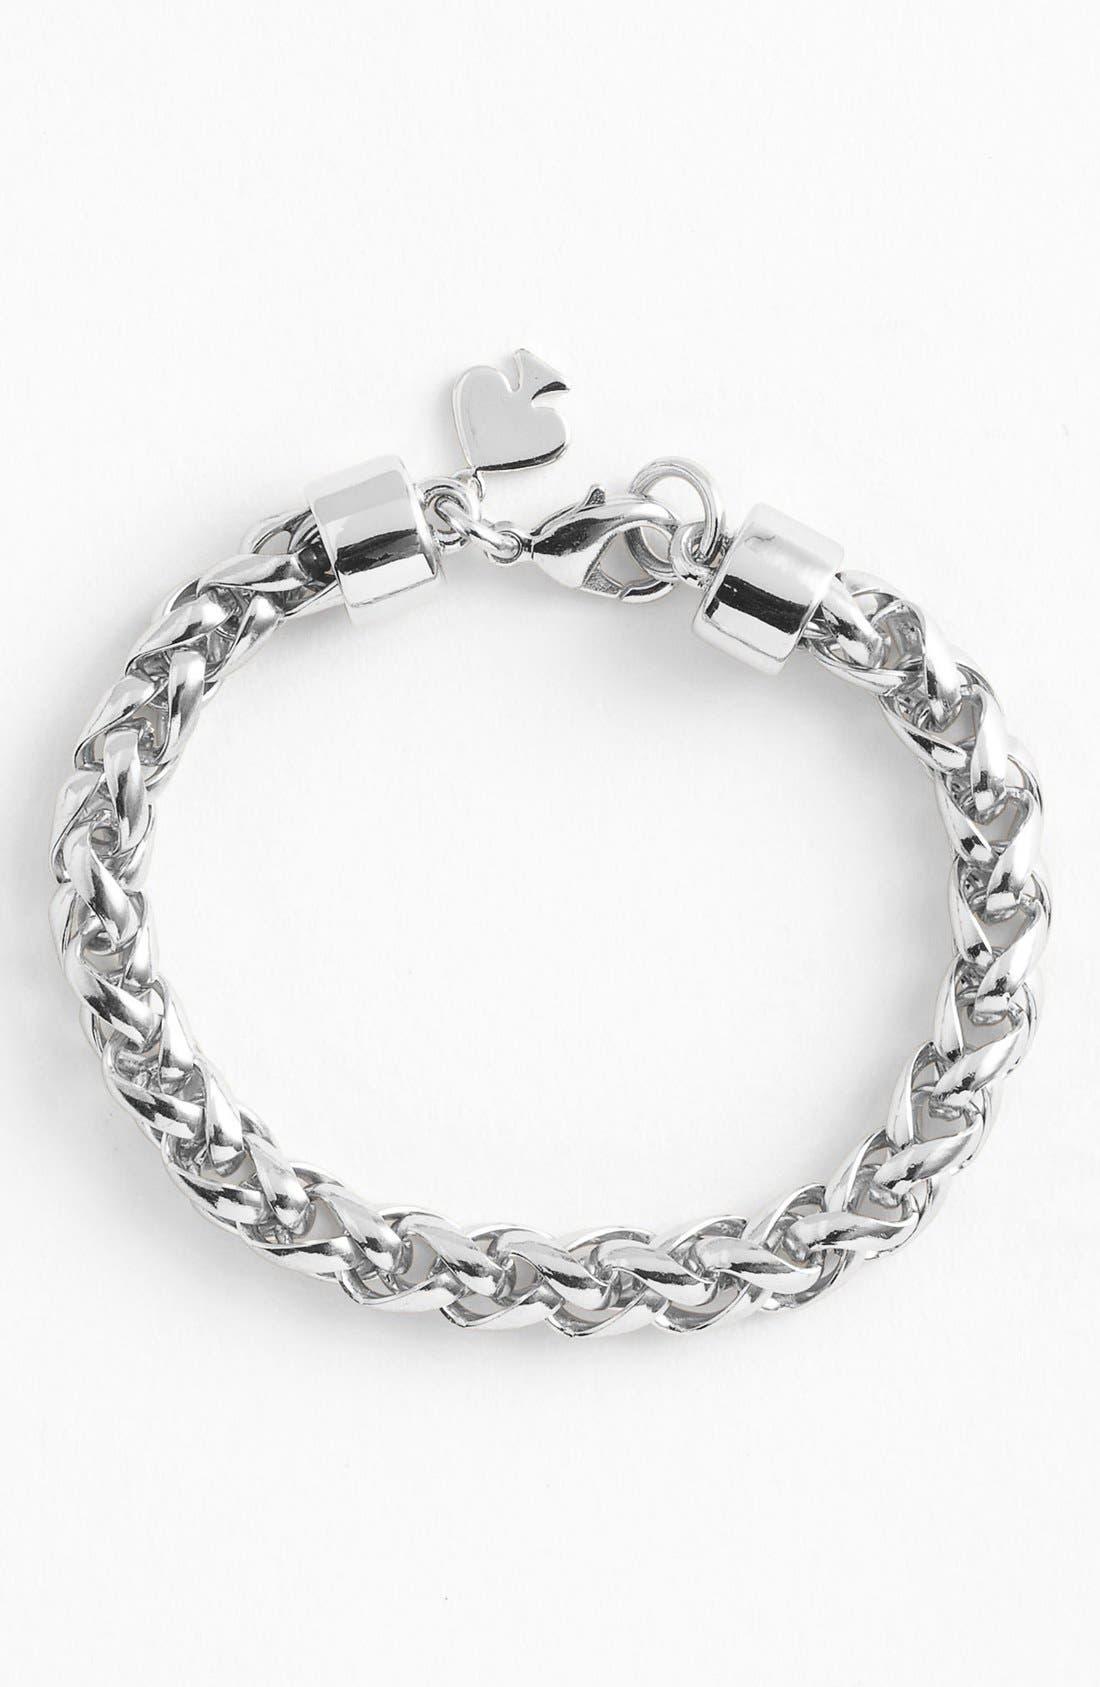 Alternate Image 1 Selected - kate spade new york 'learn the ropes' link bracelet